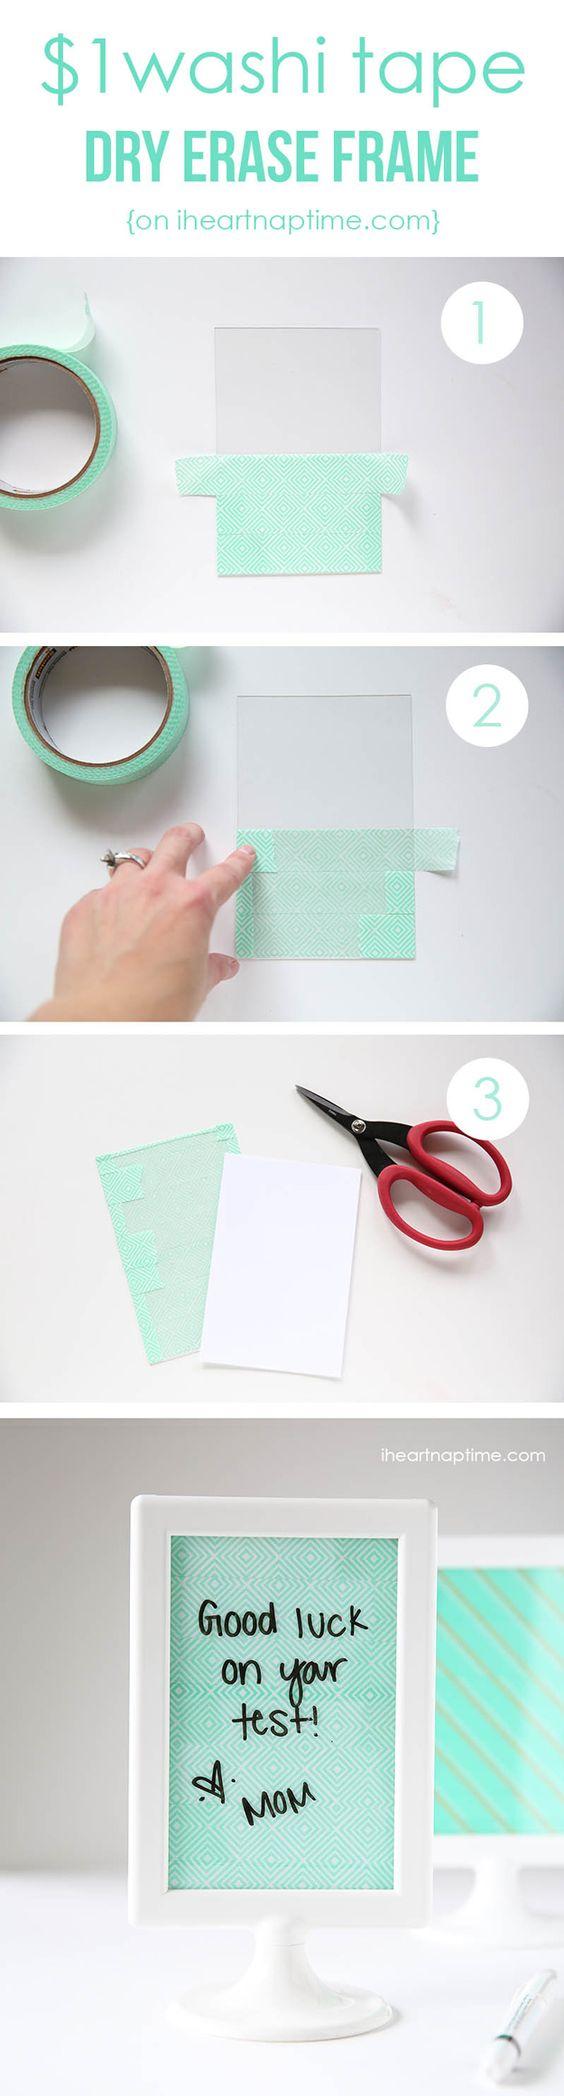 DIY Cheap Washi Tape Frame Ideas by DIY Ready at diyready.com/...